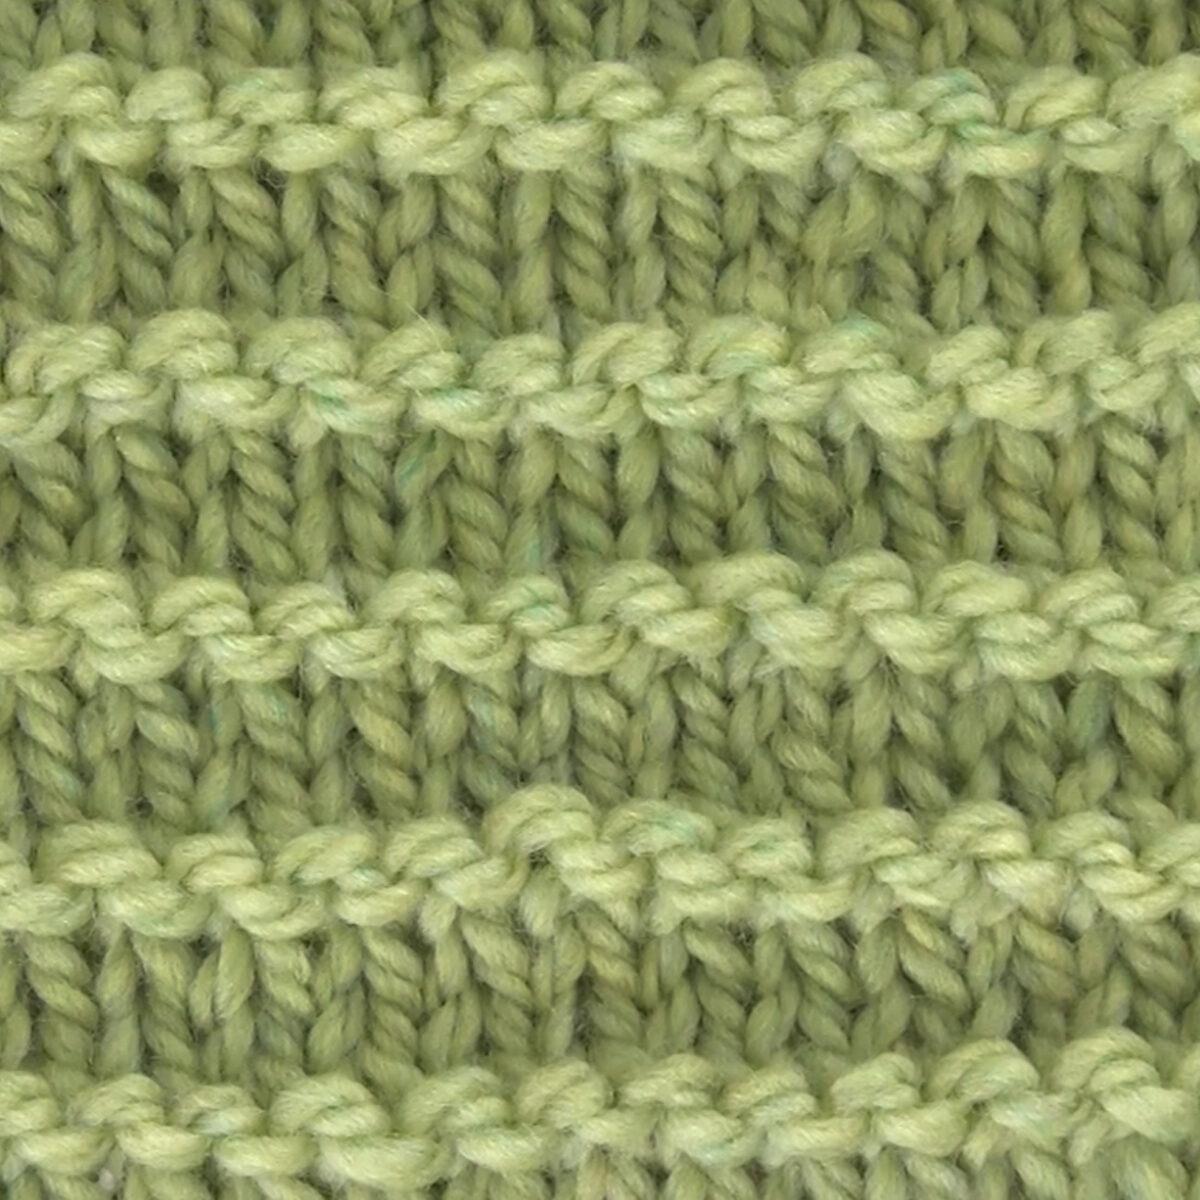 Purl Ridge Knit Pattern Texture in green yarn color.